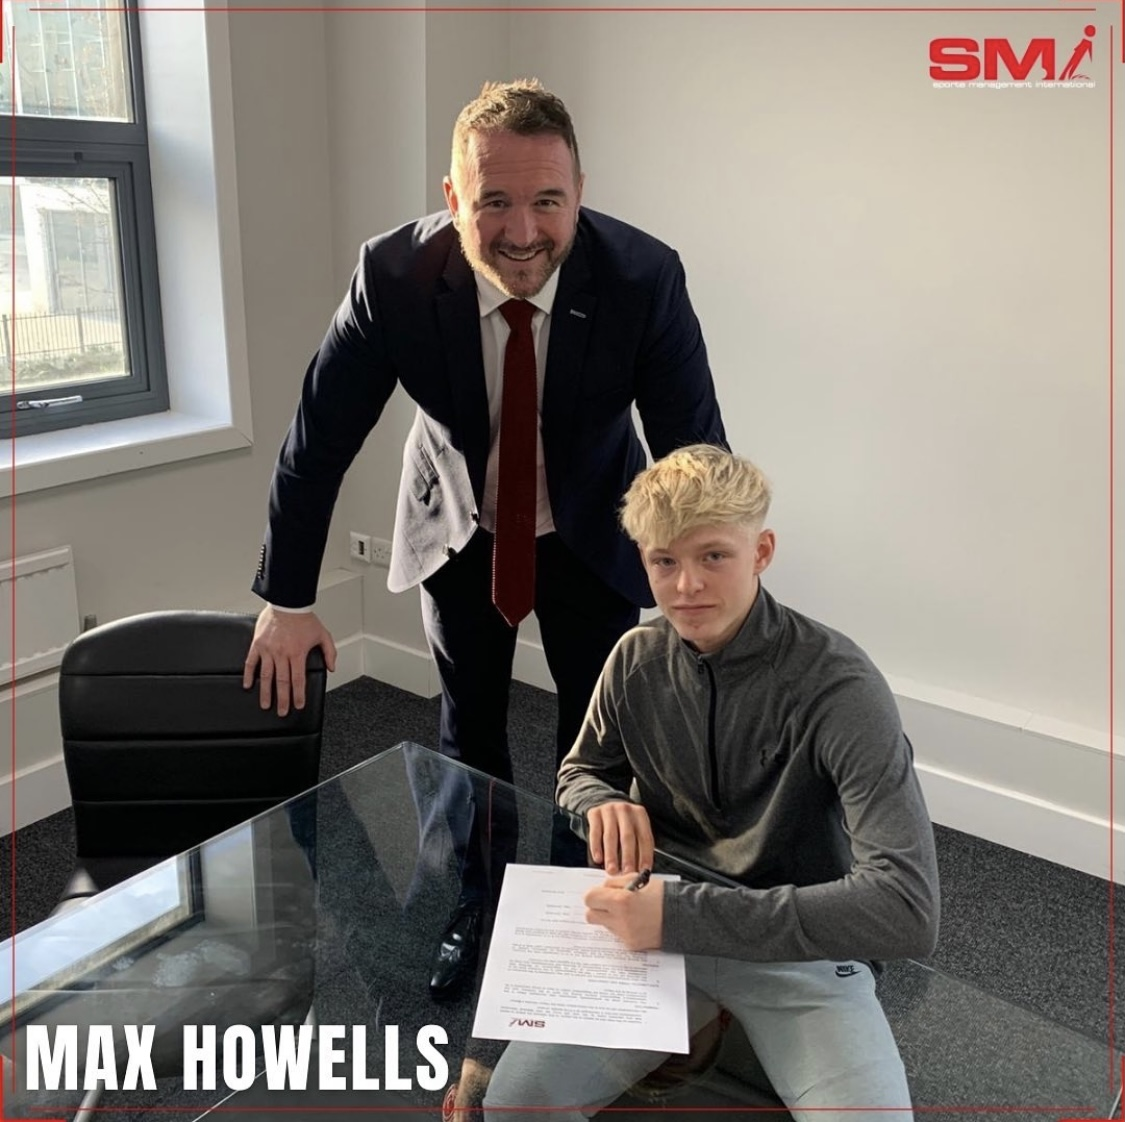 SMI Newest recruit Max Howells